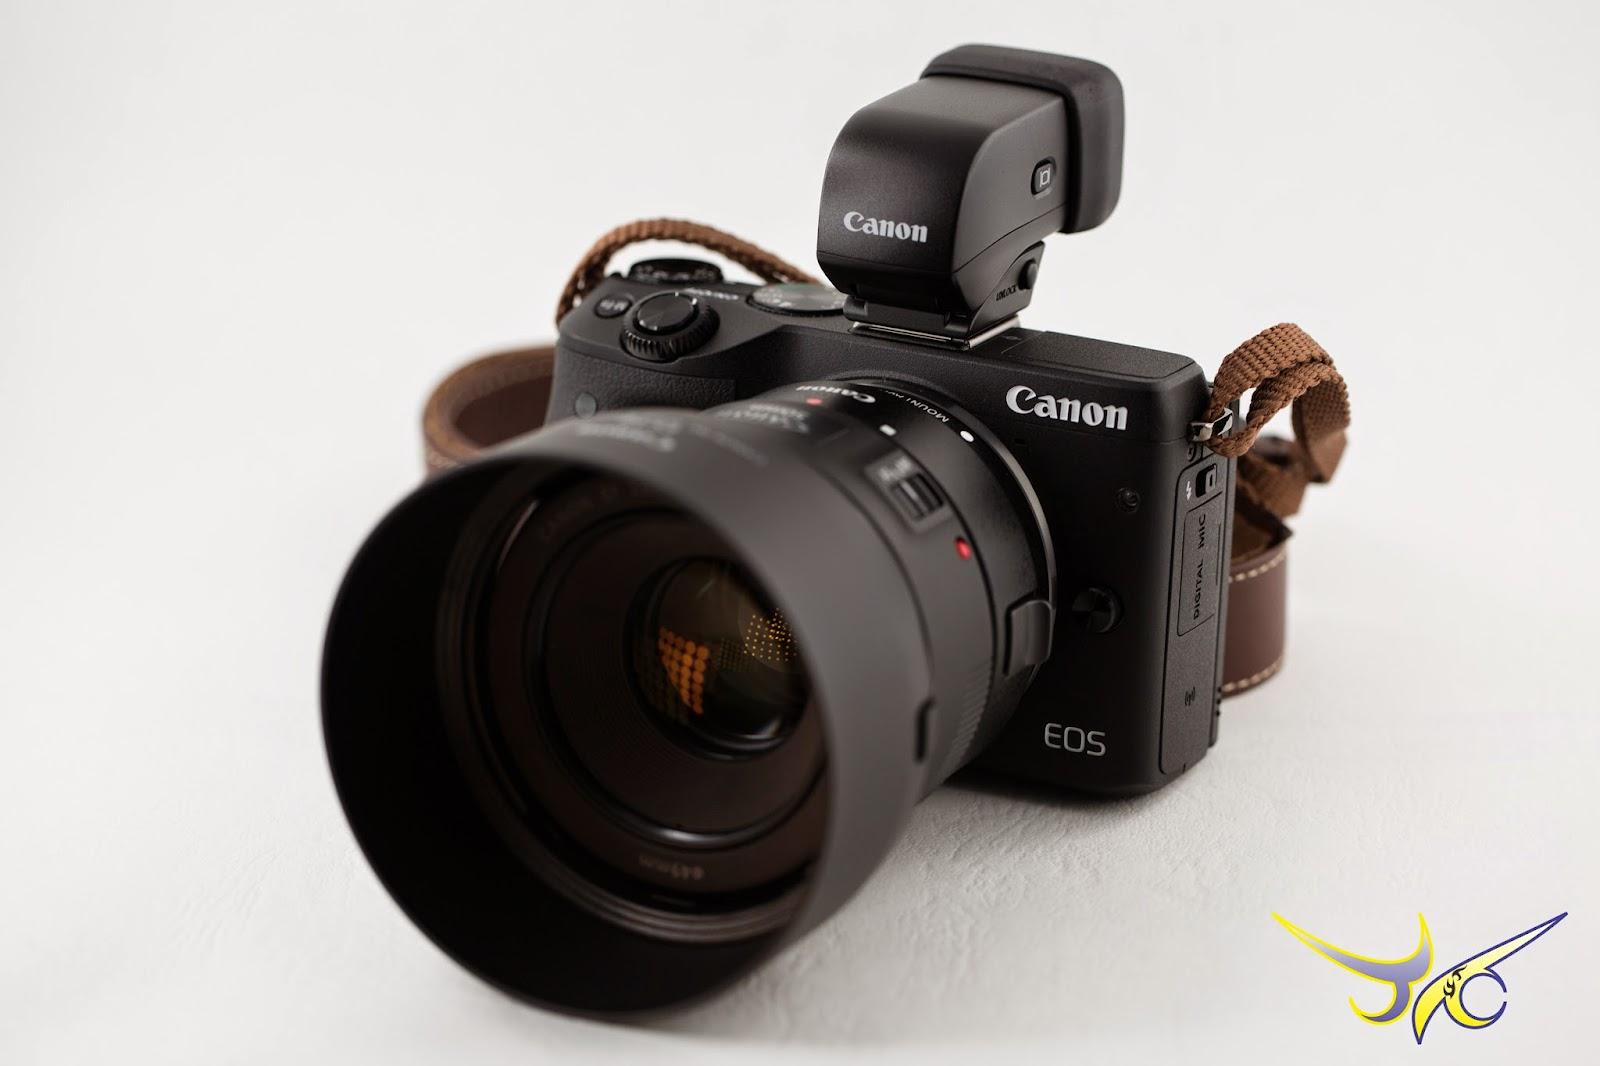 JK's Photos, Games & Toys Studio: [攝影器材] EF 50mm f/1.8 STM = 新窮人三寶 + 100積分 送ES-68鏡頭遮光罩 (Canon Club) 2015-5-21